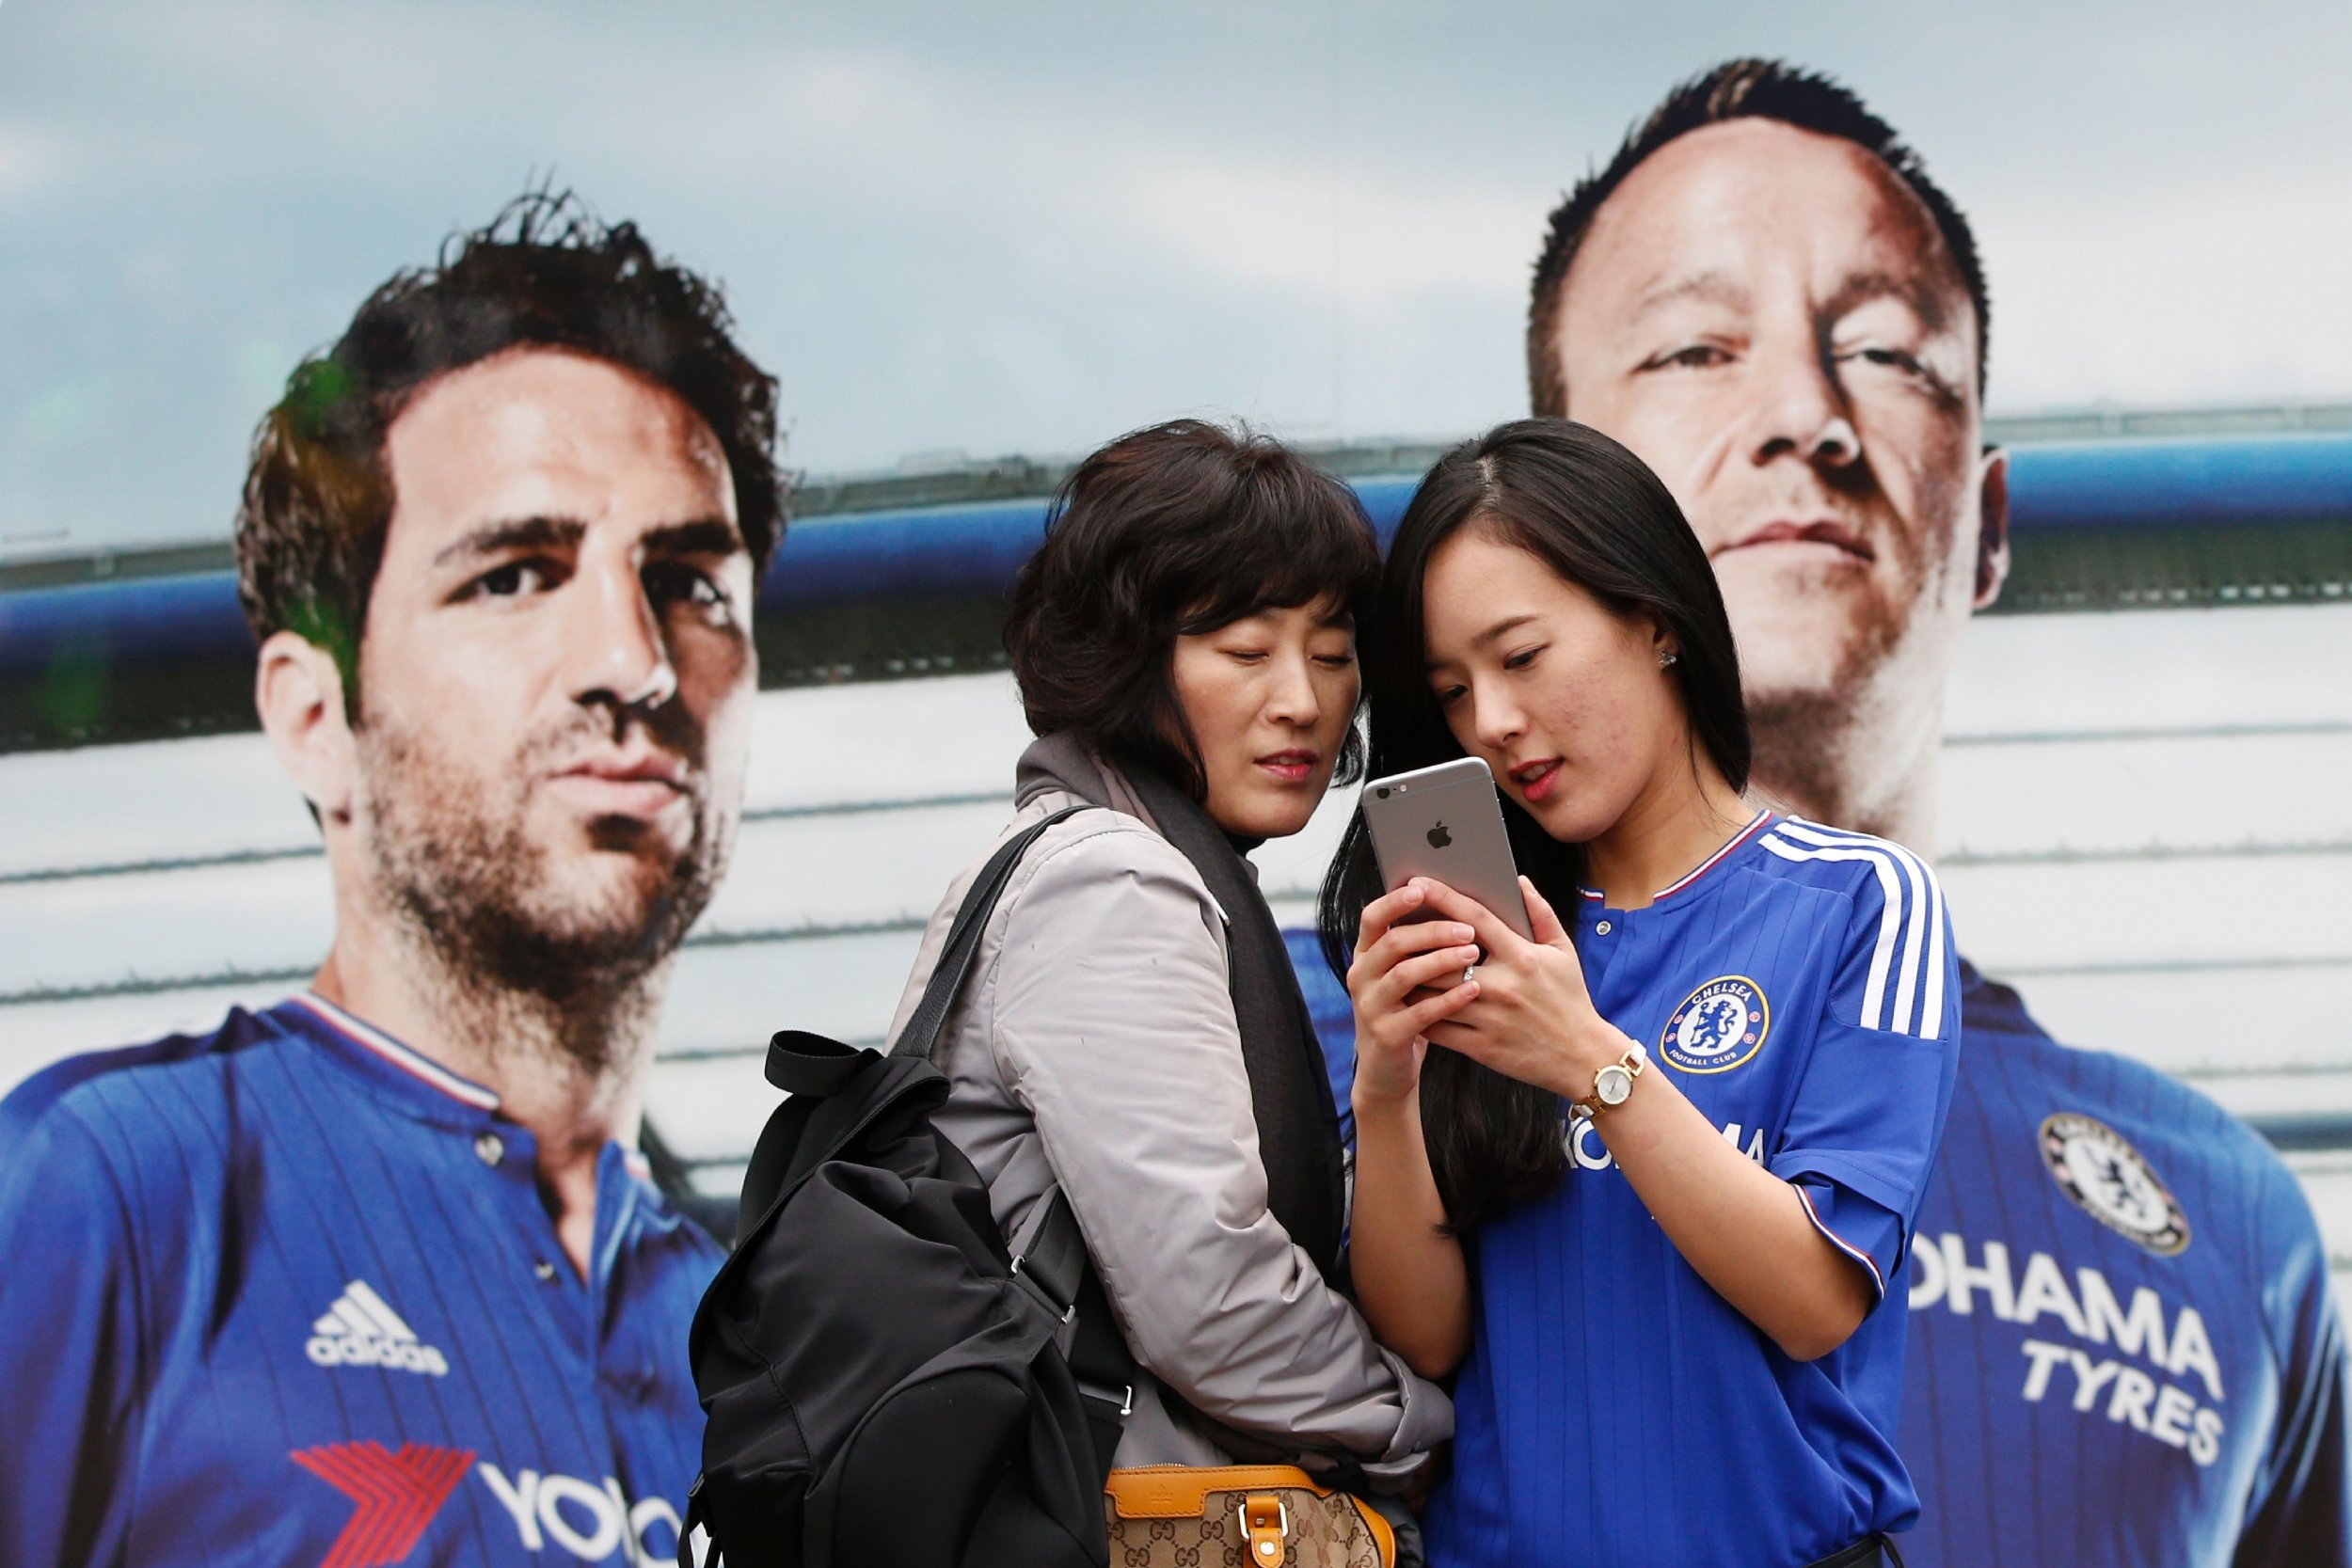 A poster at Stamford Bridge showing Cesc Fabregas, left.